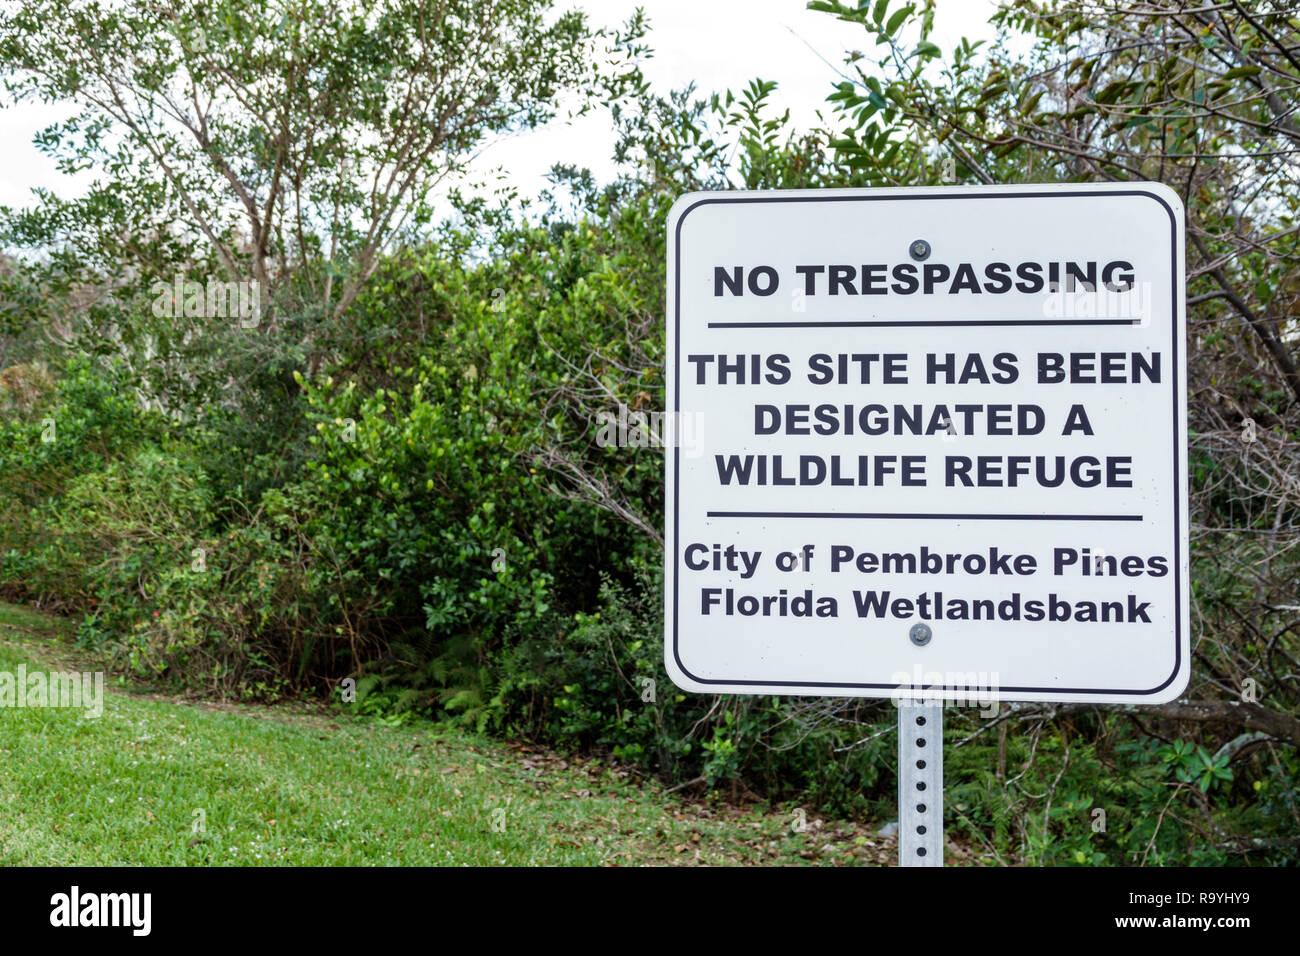 Fort Ft. Lauderdale Florida Pembroke Pines Chapel Trail Nature Preserve park sign no trespassing site designated wildlife refuge - Stock Image